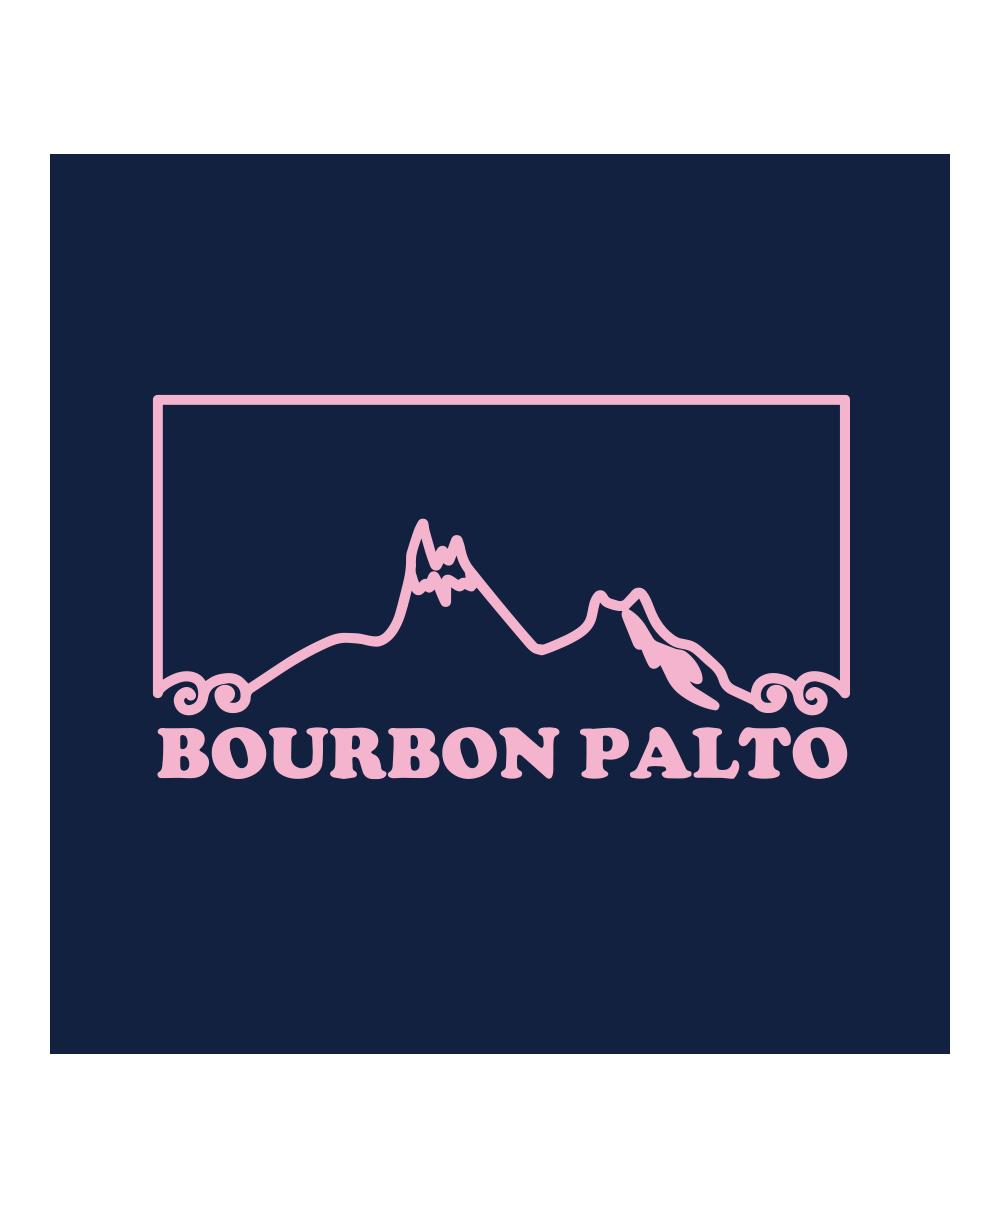 Bourbon Palto